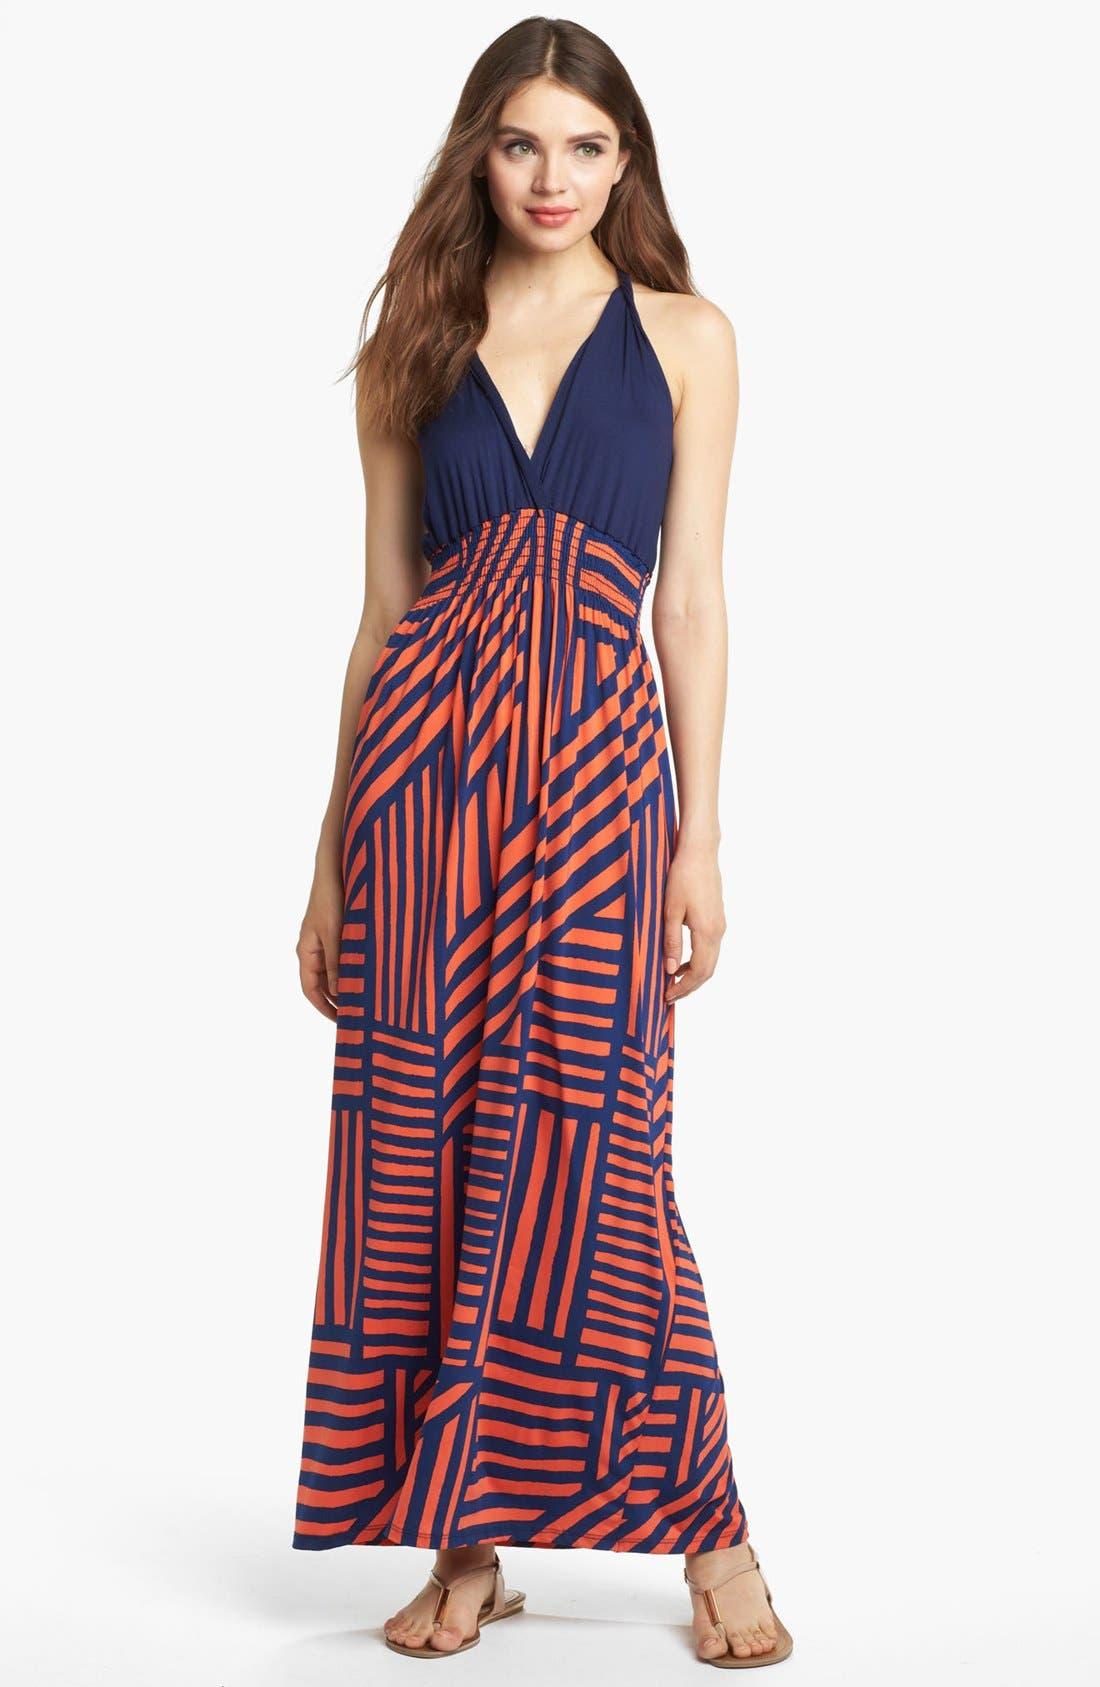 Alternate Image 1 Selected - Felicity & Coco Printed Maxi Dress (Regular & Petite) (Nordstrom Exclusive)